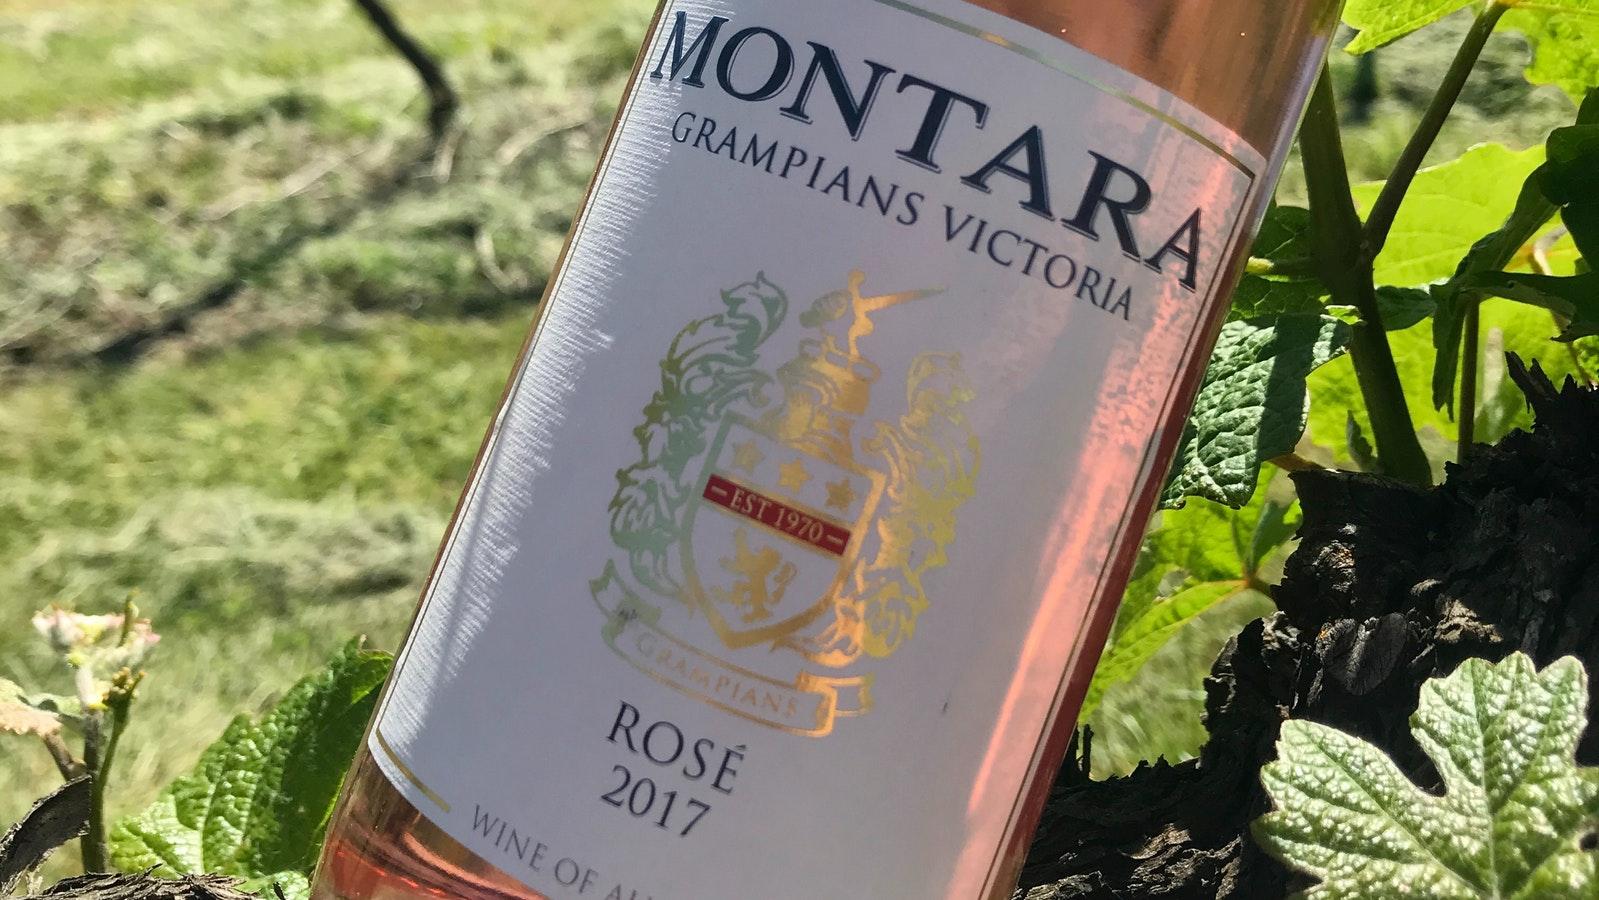 Wine in the vineyard